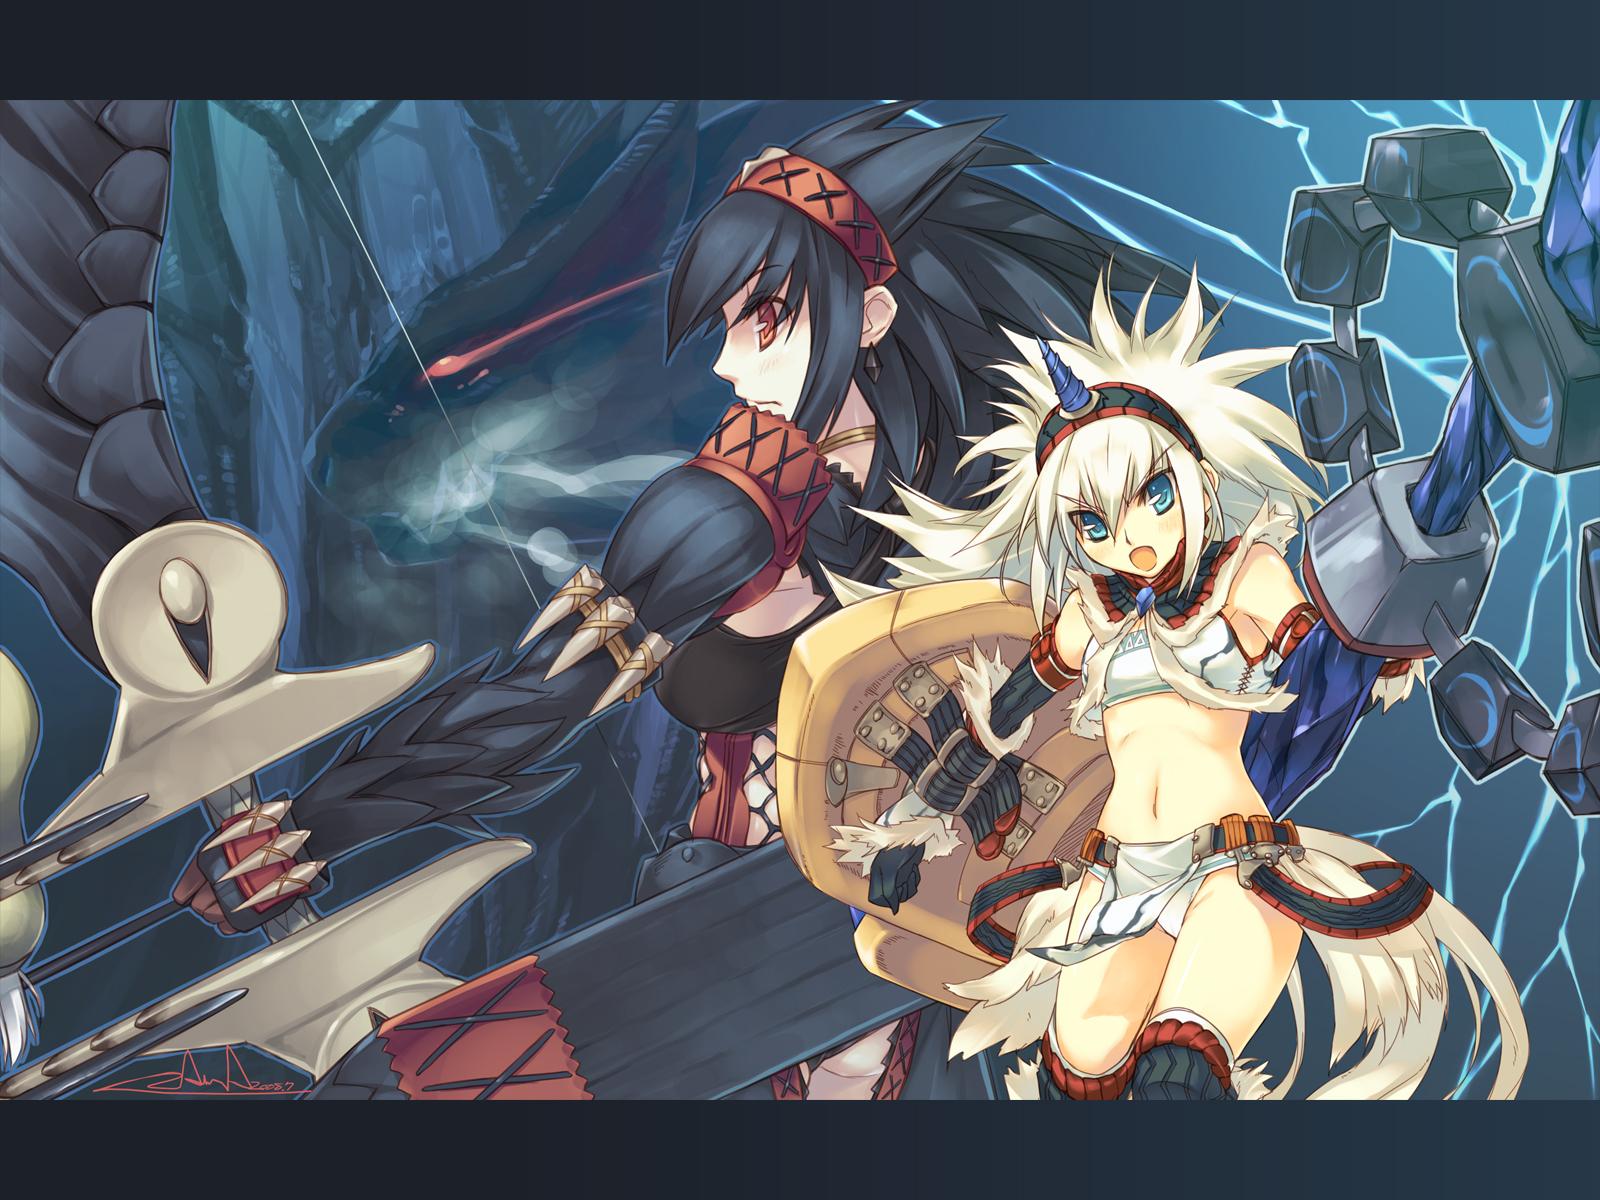 colorful_dot kirin_(armor) monster_hunter nargacuga_(armor) zama_masaaki